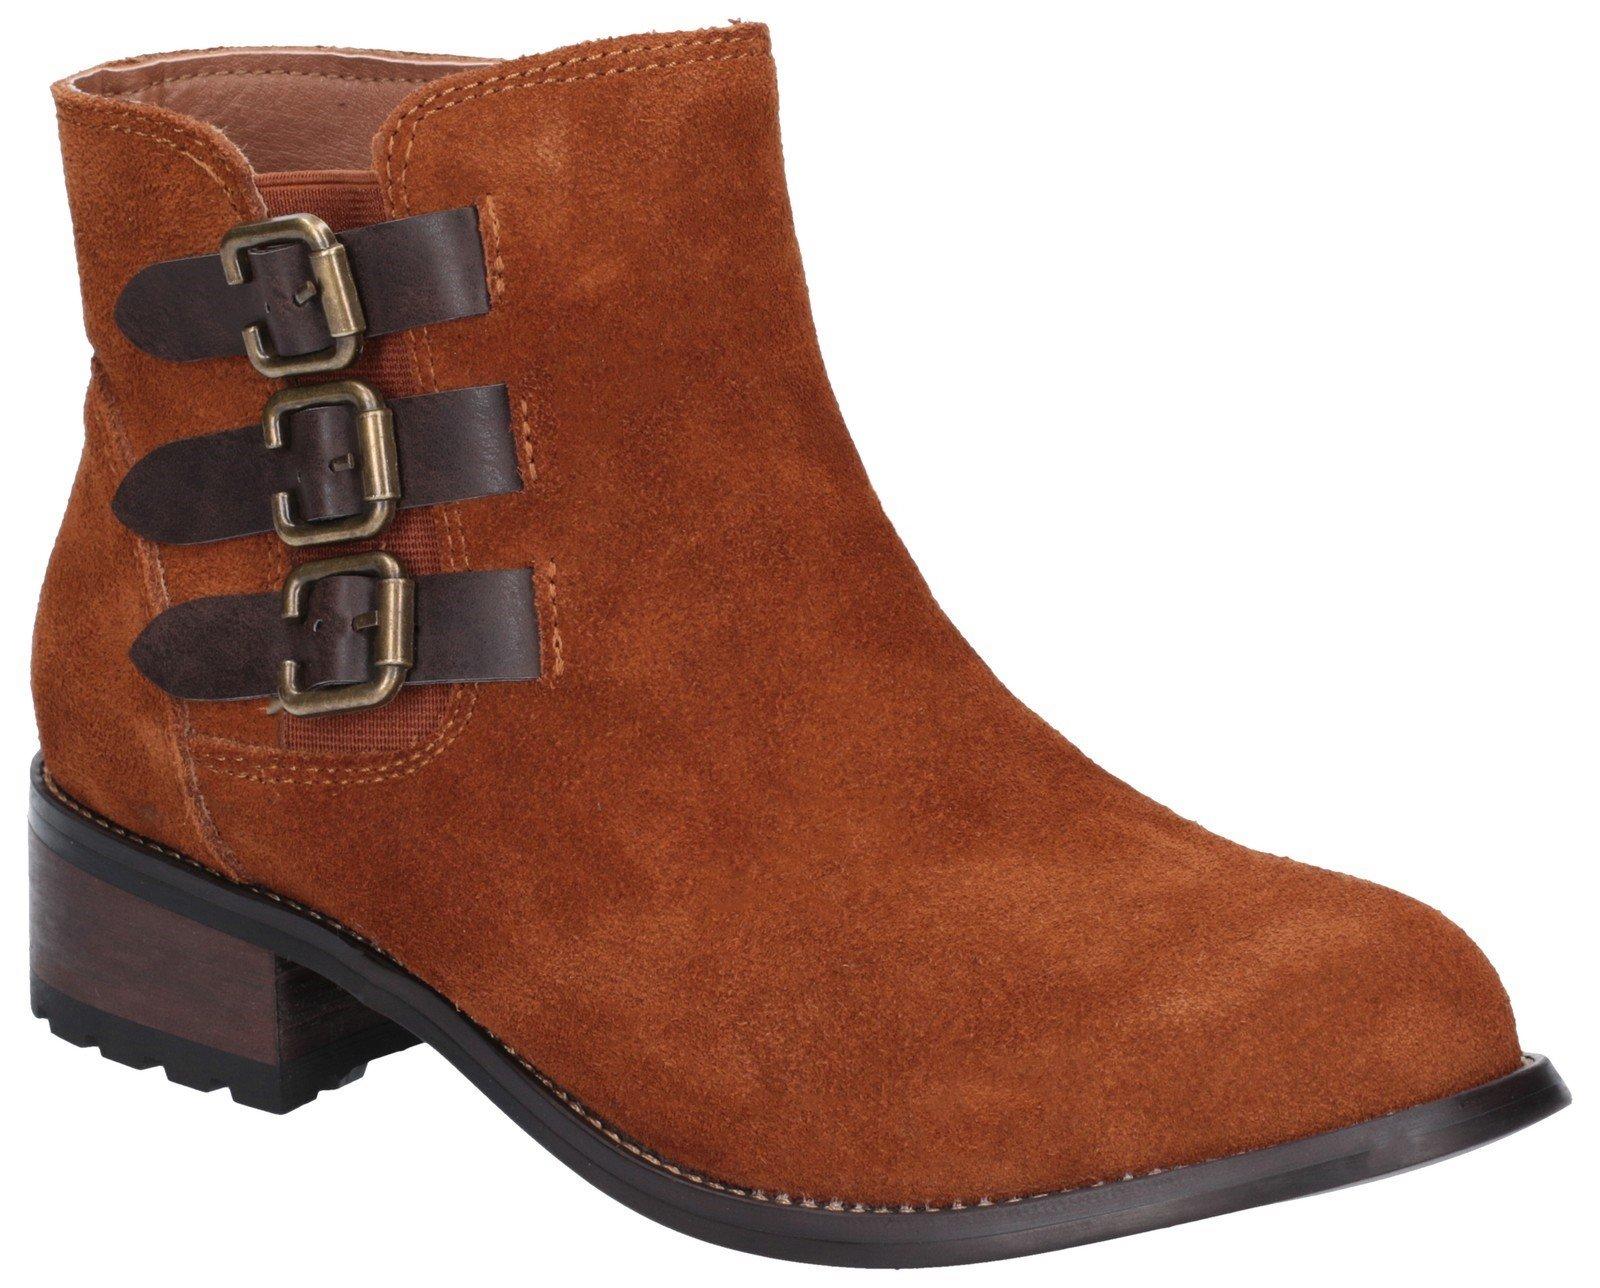 Divaz Women's Lexi Slip On Buckle Boot Black 27162-45641 - Tan 3